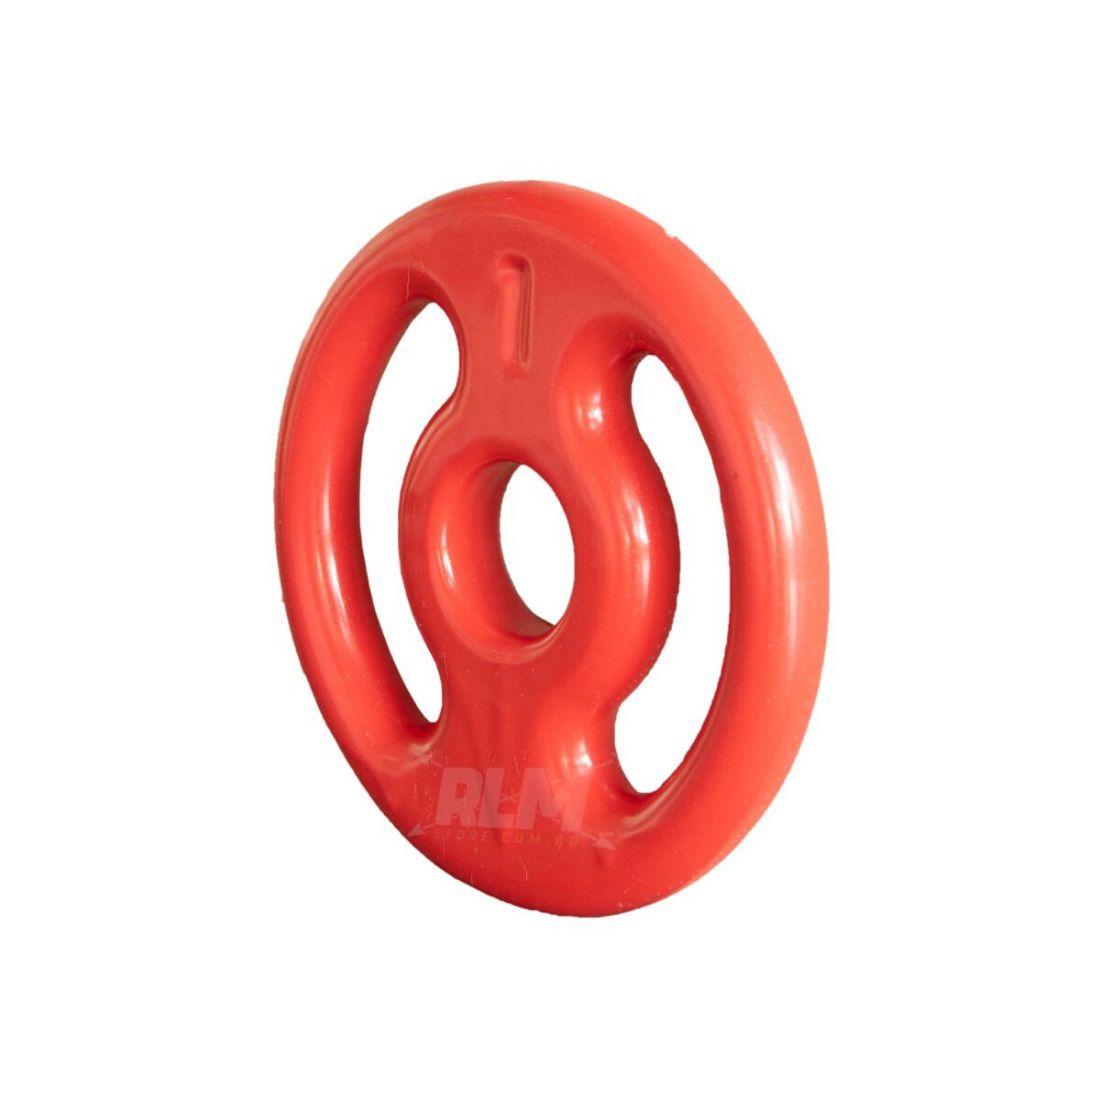 Anilha Emborrachada 1 Kg - Vermelha